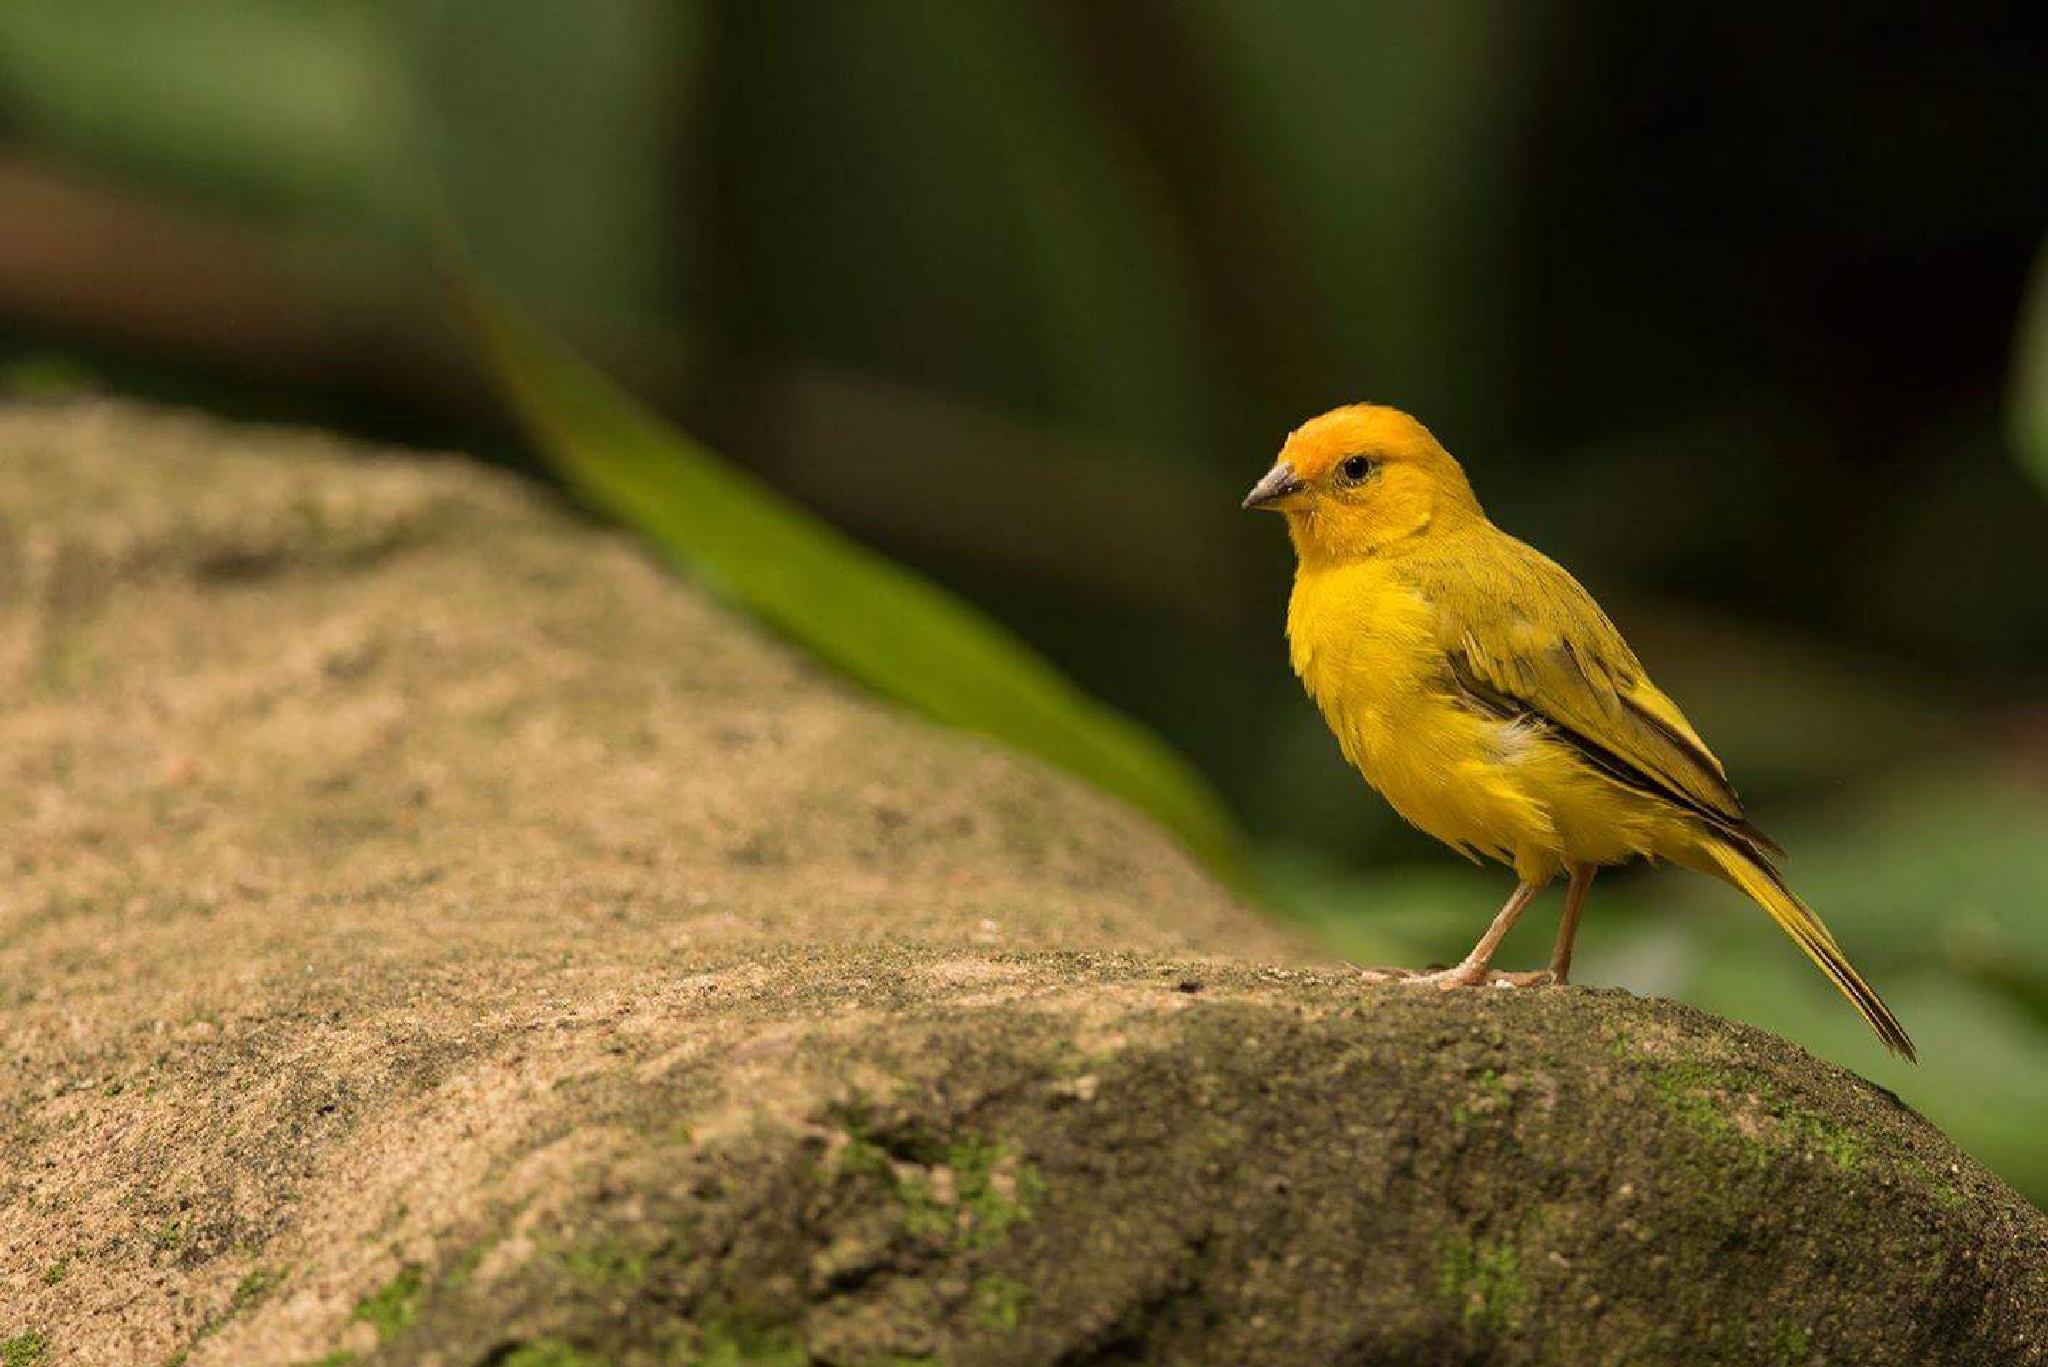 Saffron Finch by Arpan Dalal